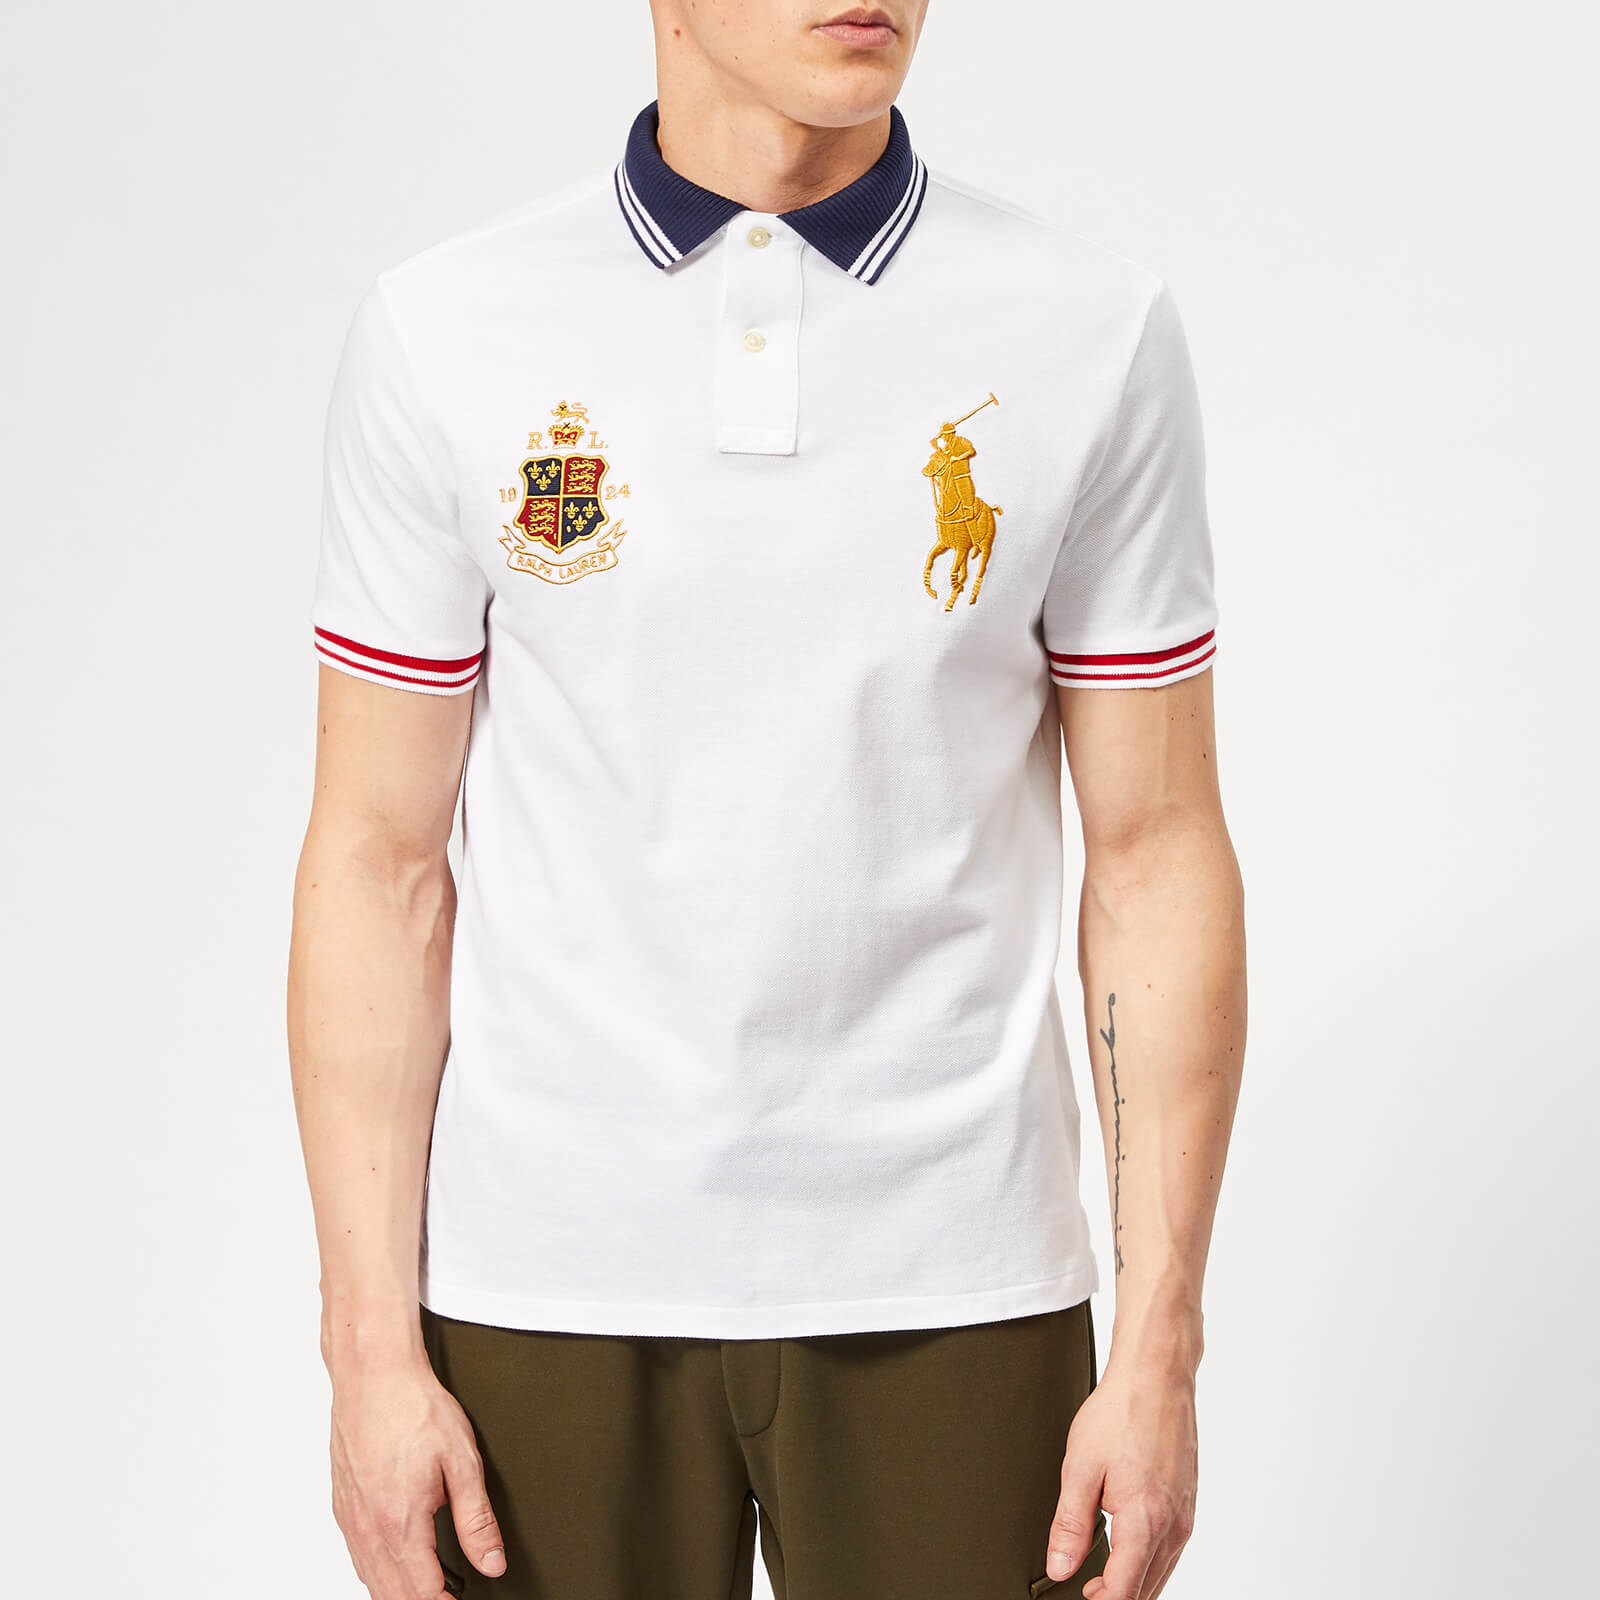 Ralph Cresthorse White Lauren Shirt Men's Pique Polo srdQohxtCB